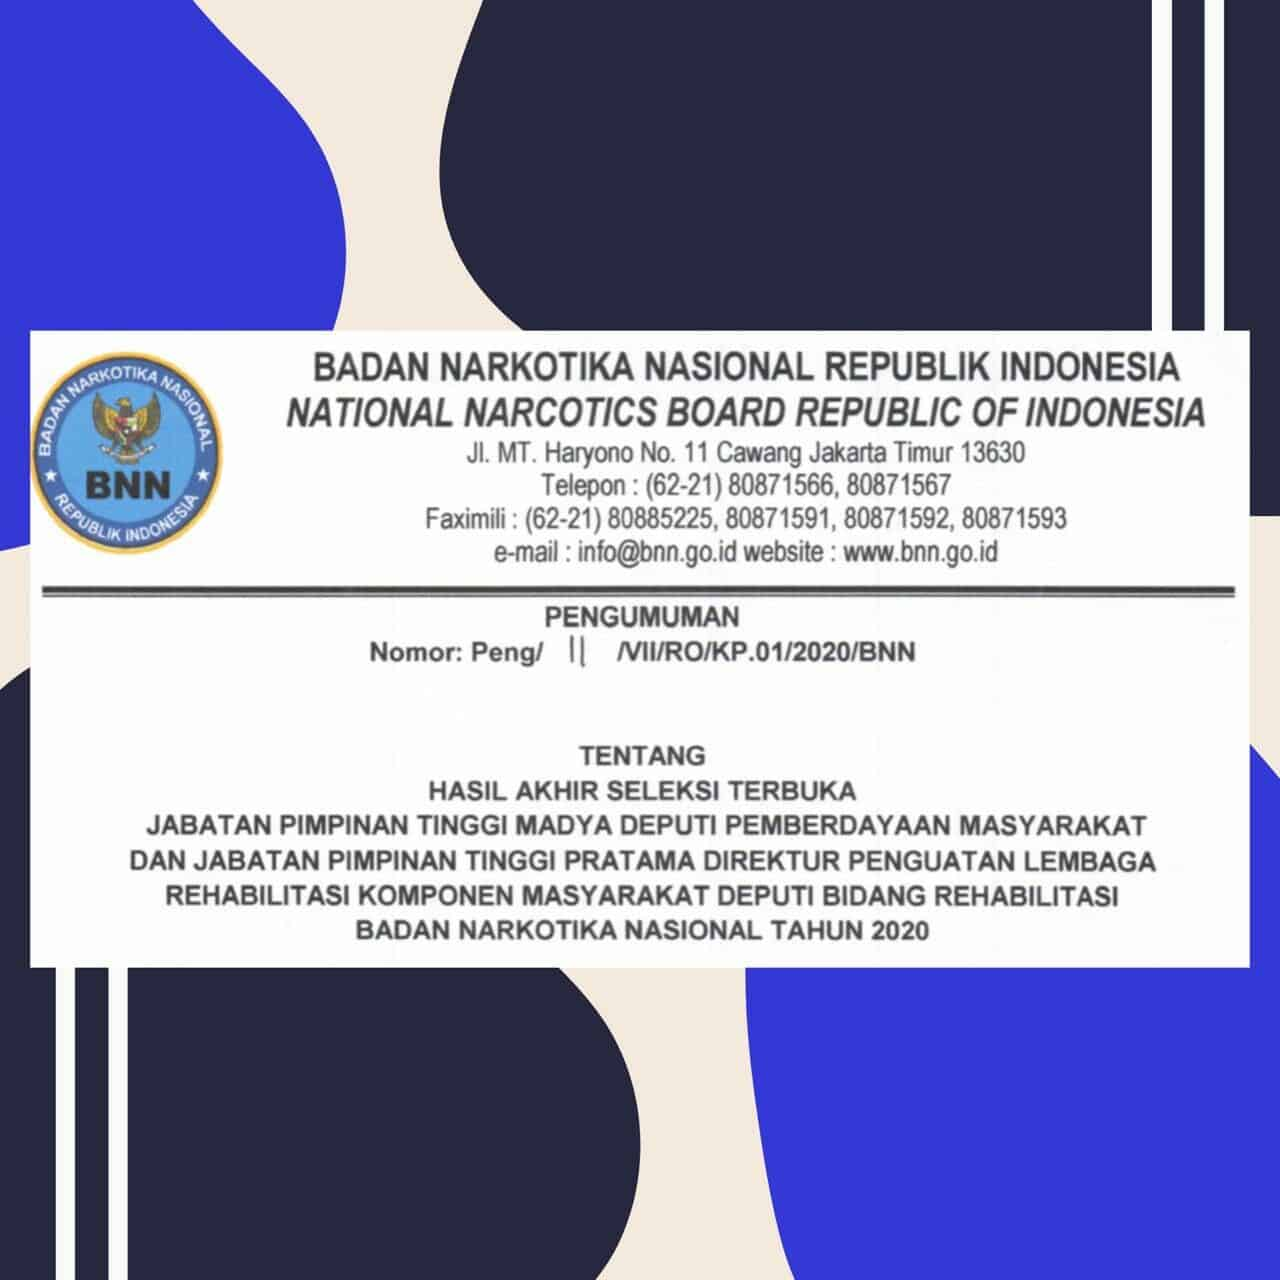 Pengumuman Hasil Akhir Seleksi Terbuka Jabatan Pimpinan Tinggi Madya Deputi Bidang Pemberdayaan Masyarakat dan Direktur PLRKM Deputi Bidan Rehabilitasi BNN